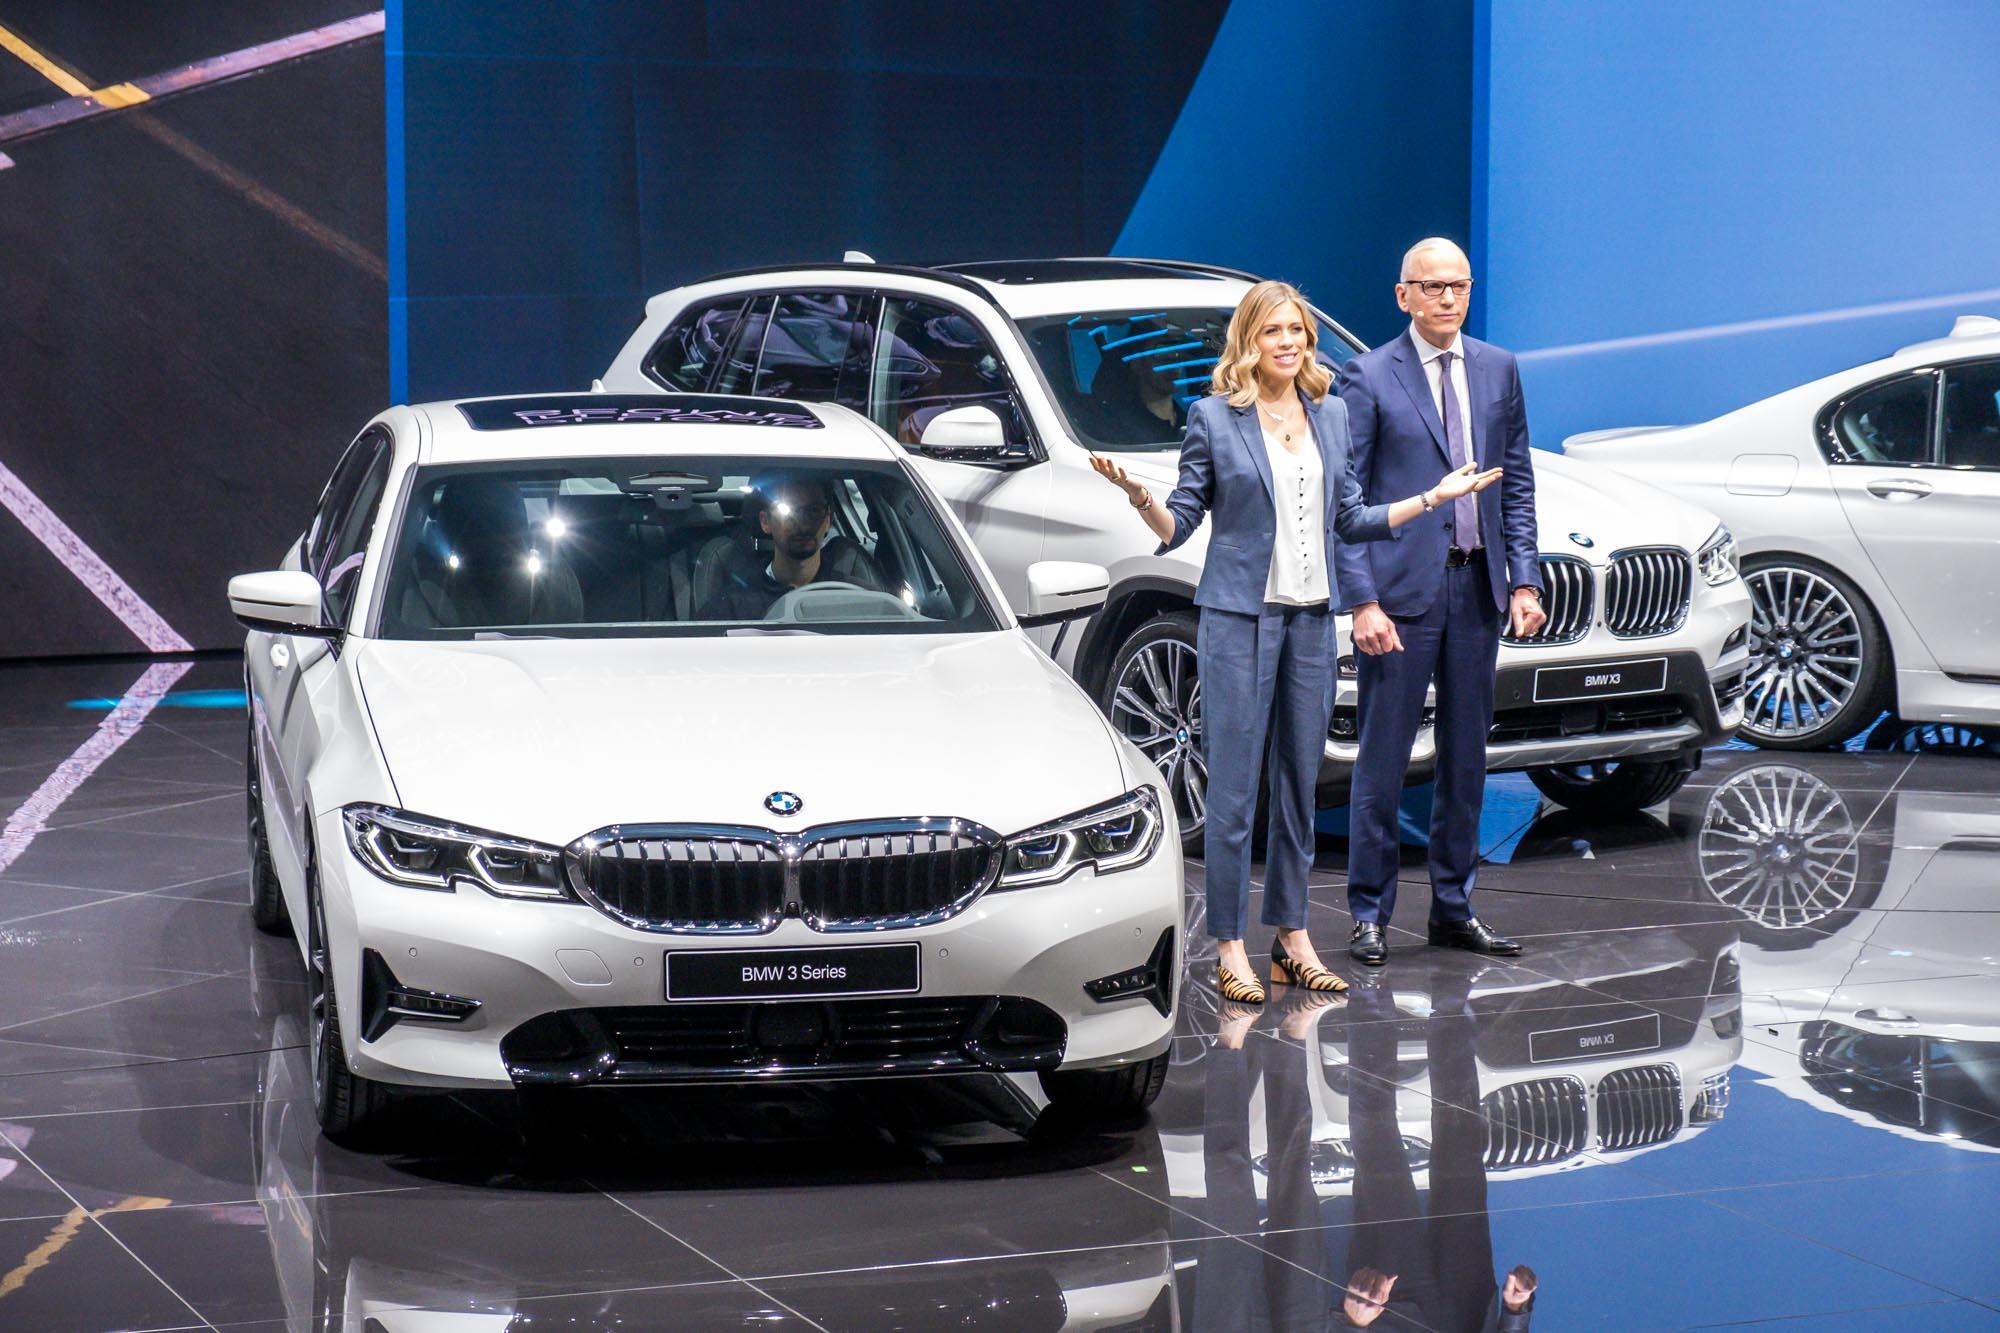 BMW Híbridos Plug-In